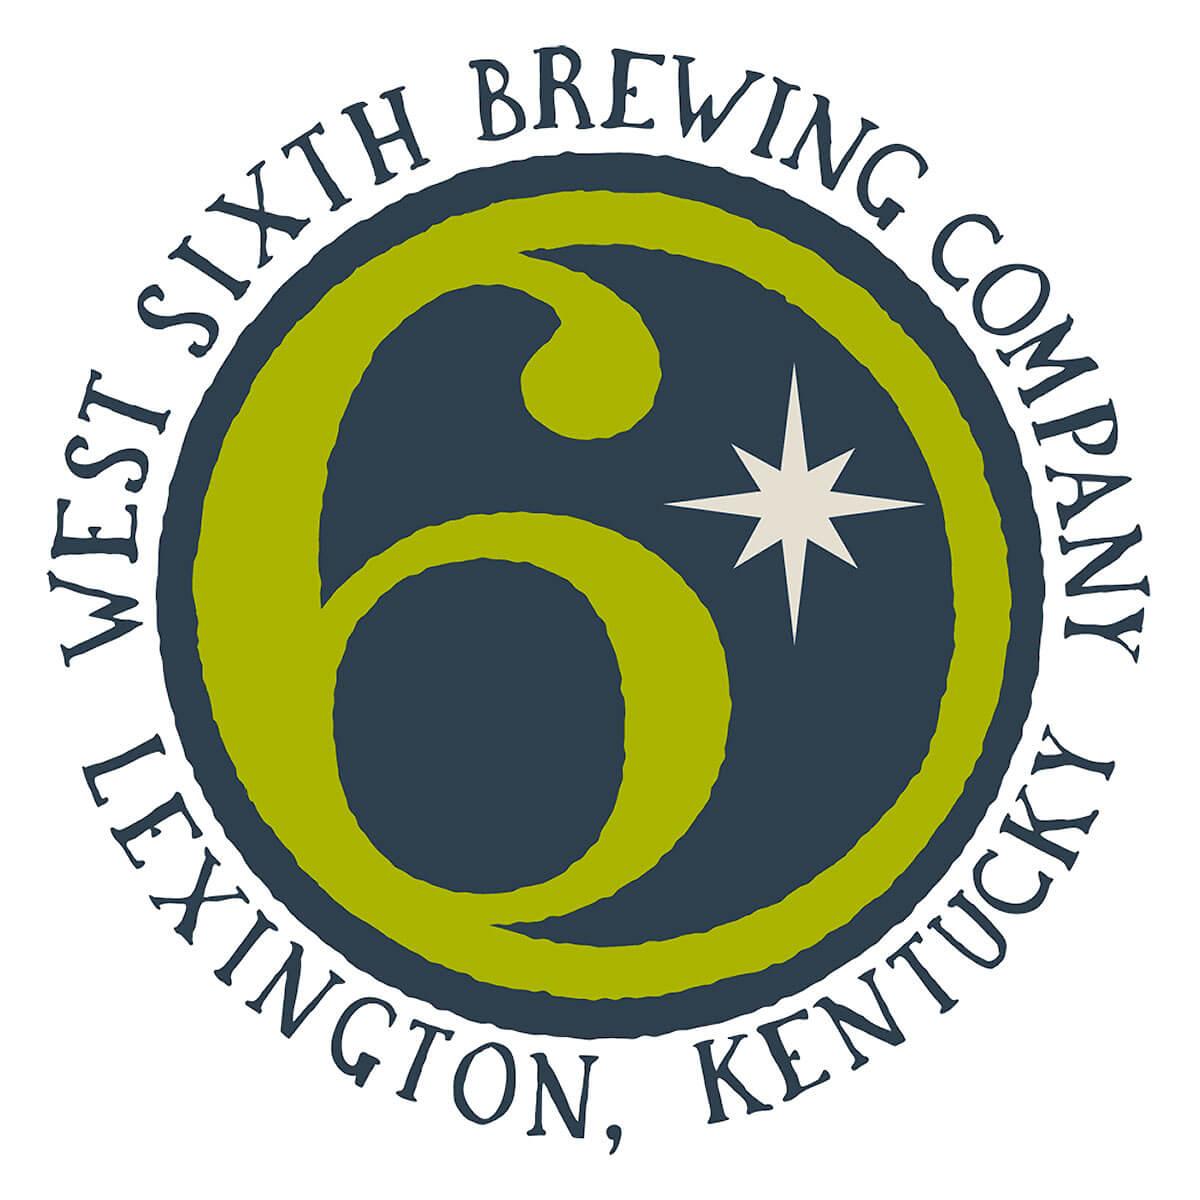 West Sixth Brewing Company Logo